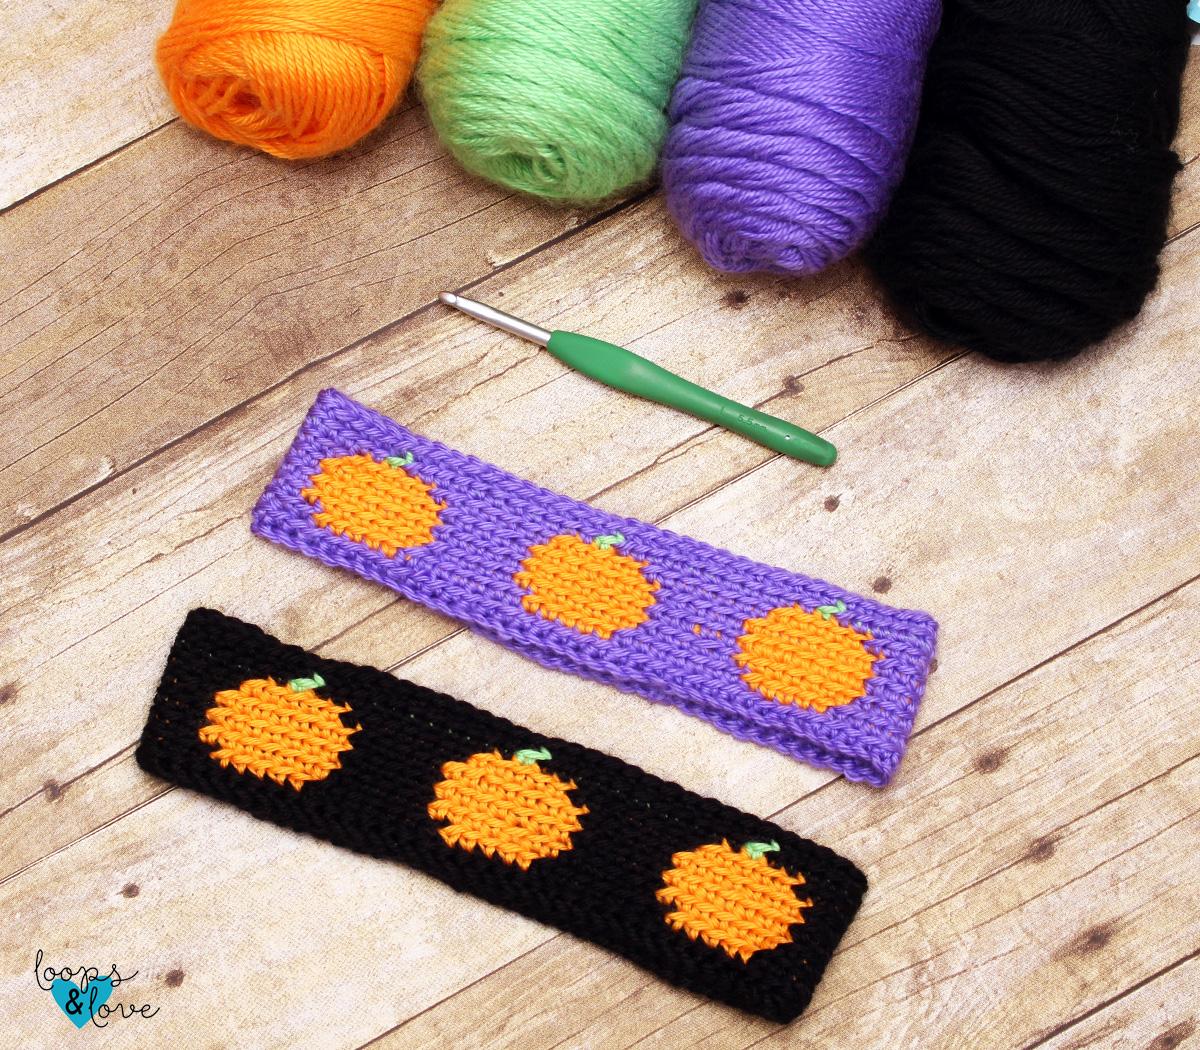 Crochet Pumpkin Headband - Free Crochet Pattern